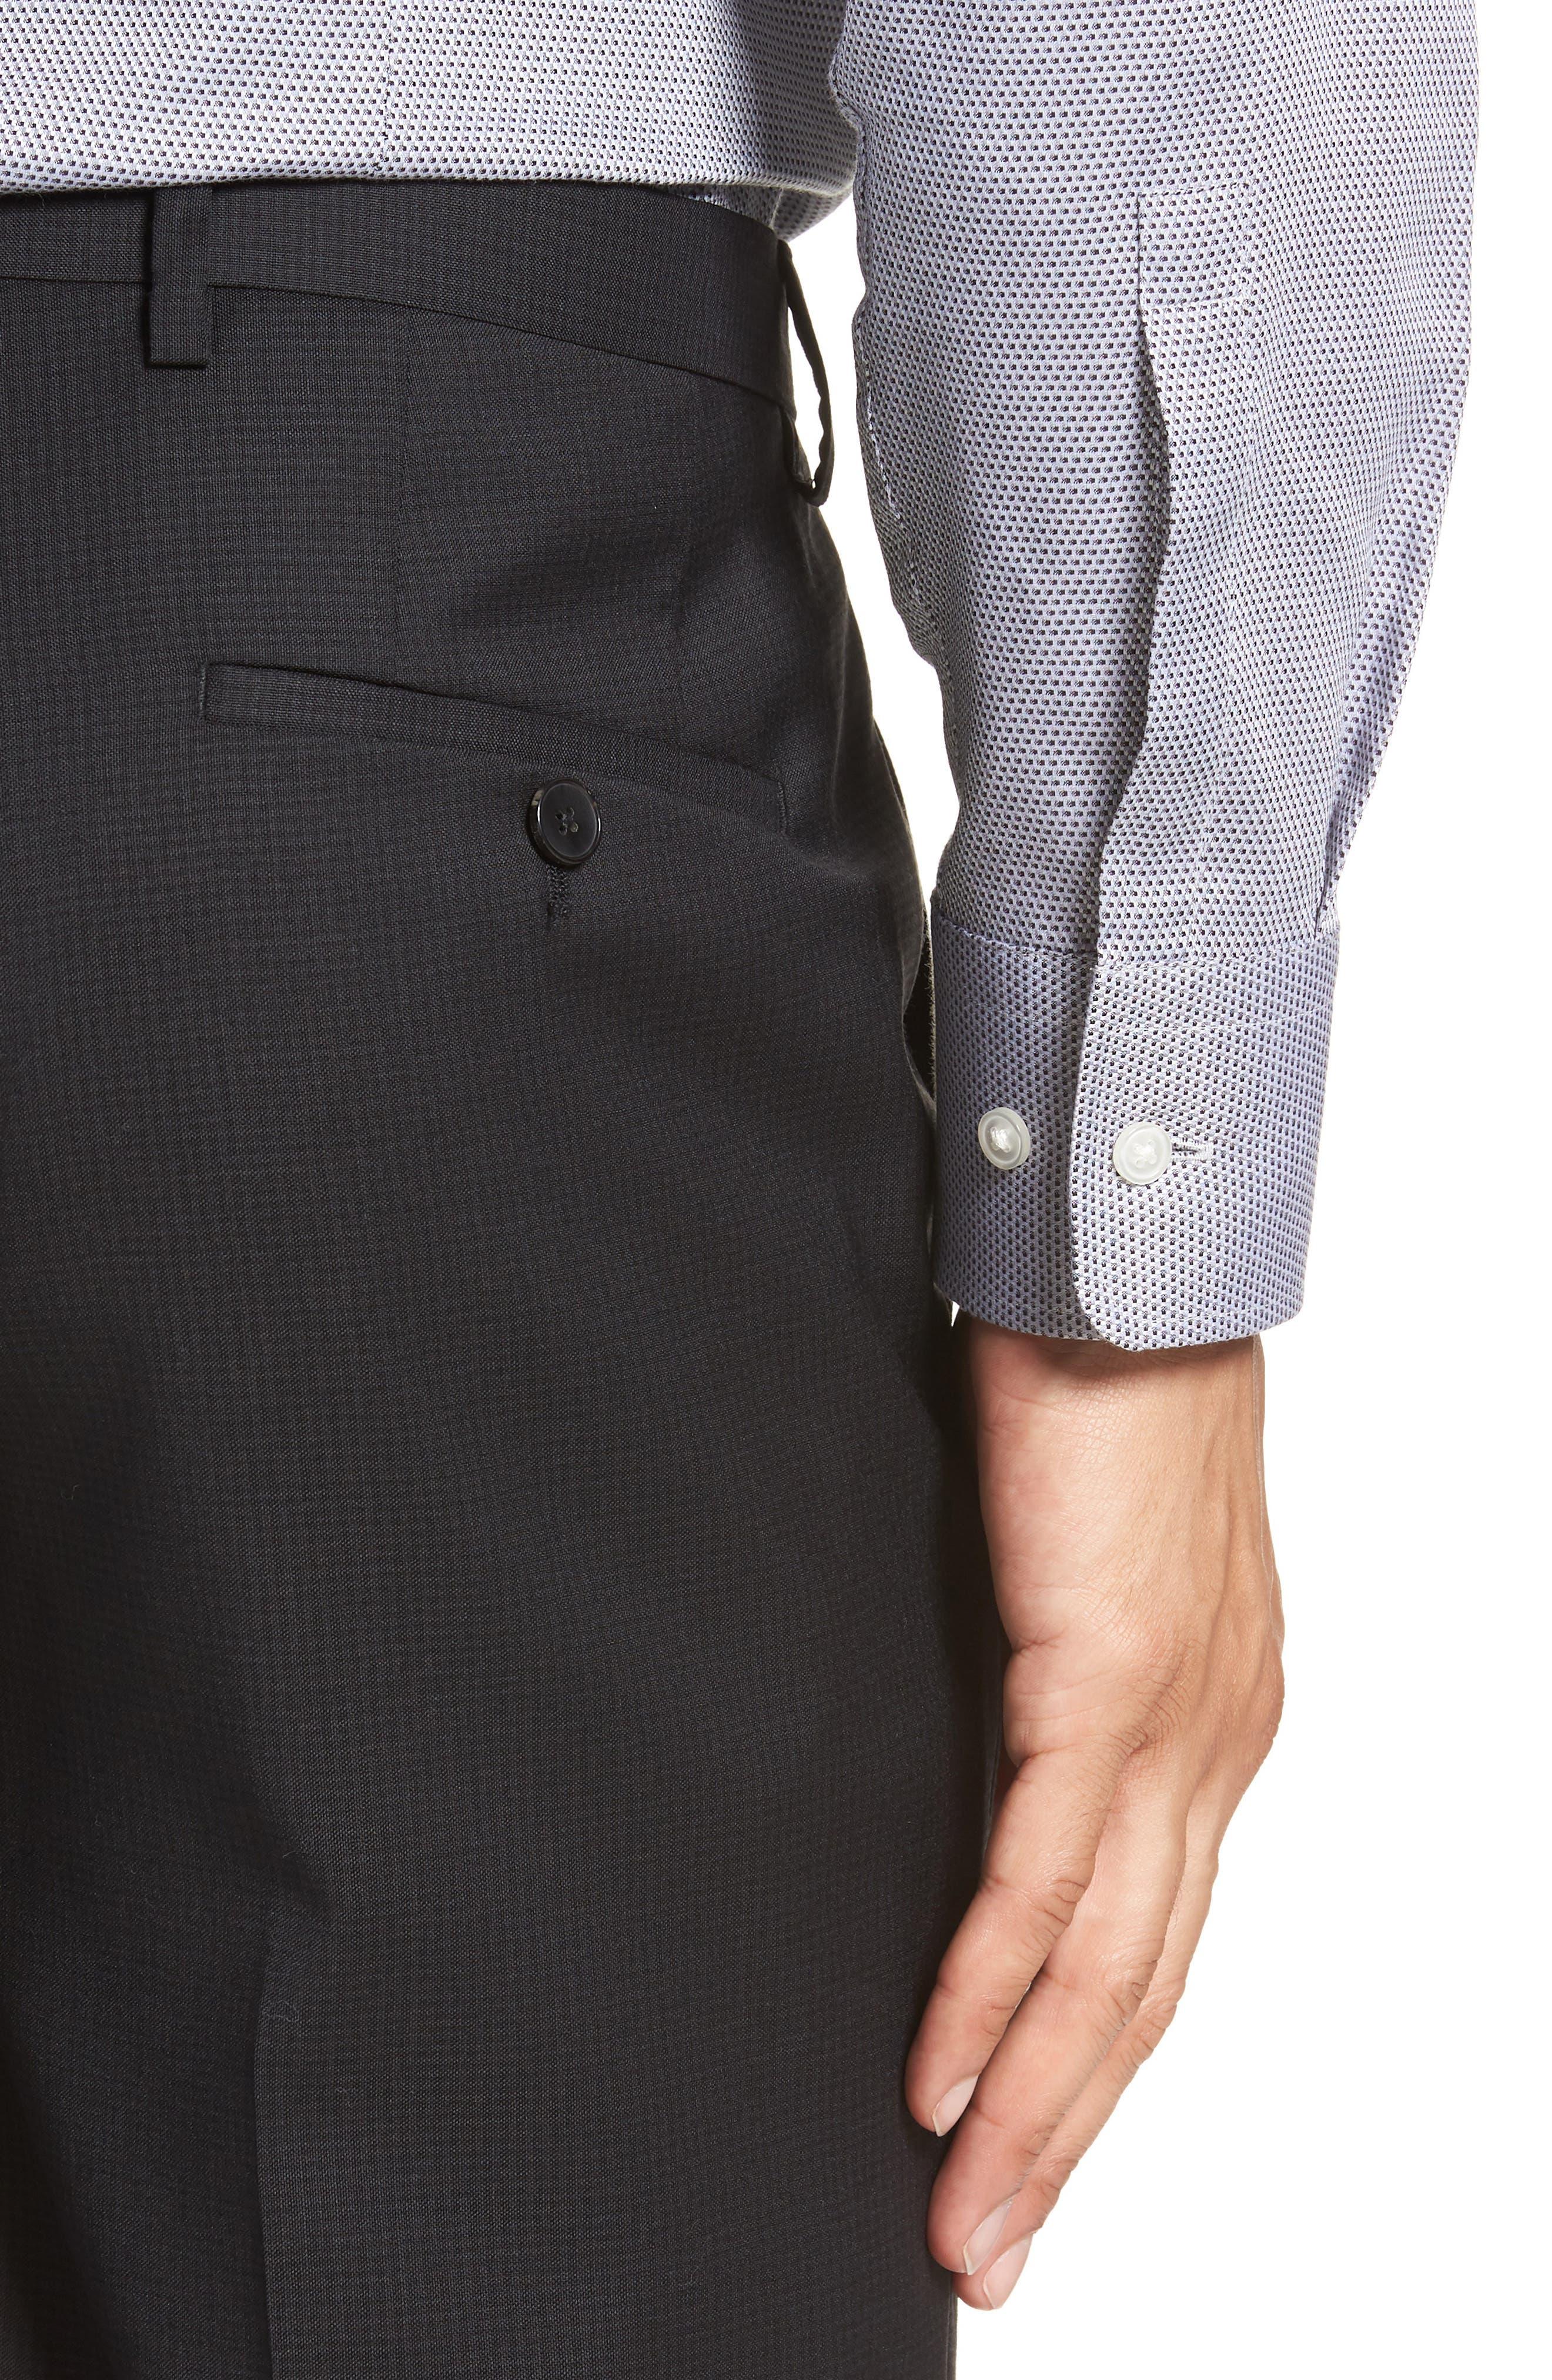 Leenon Flat Front Check Wool Trousers,                             Alternate thumbnail 4, color,                             BLACK